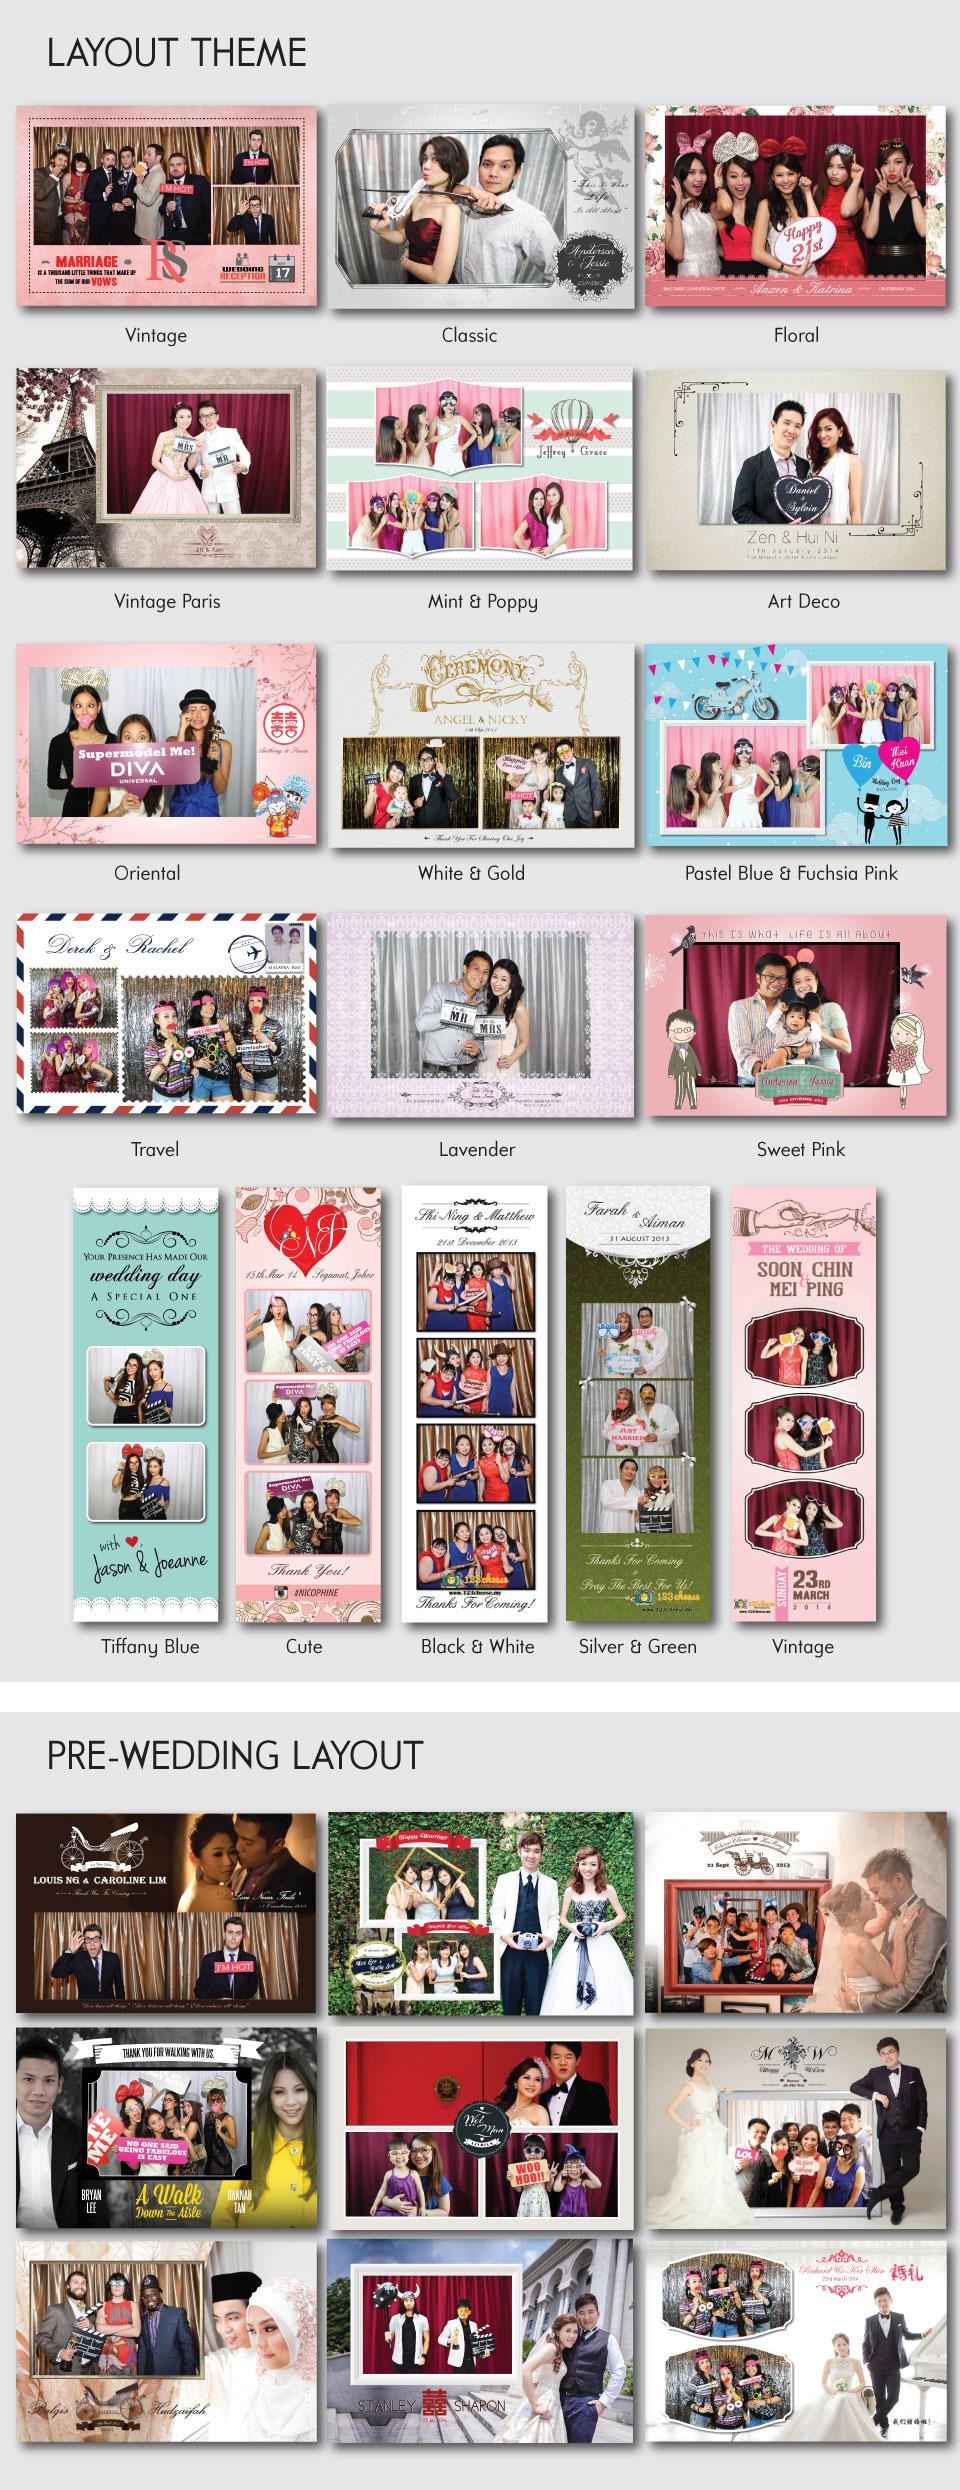 Website-layout-theme-(WEDDING)